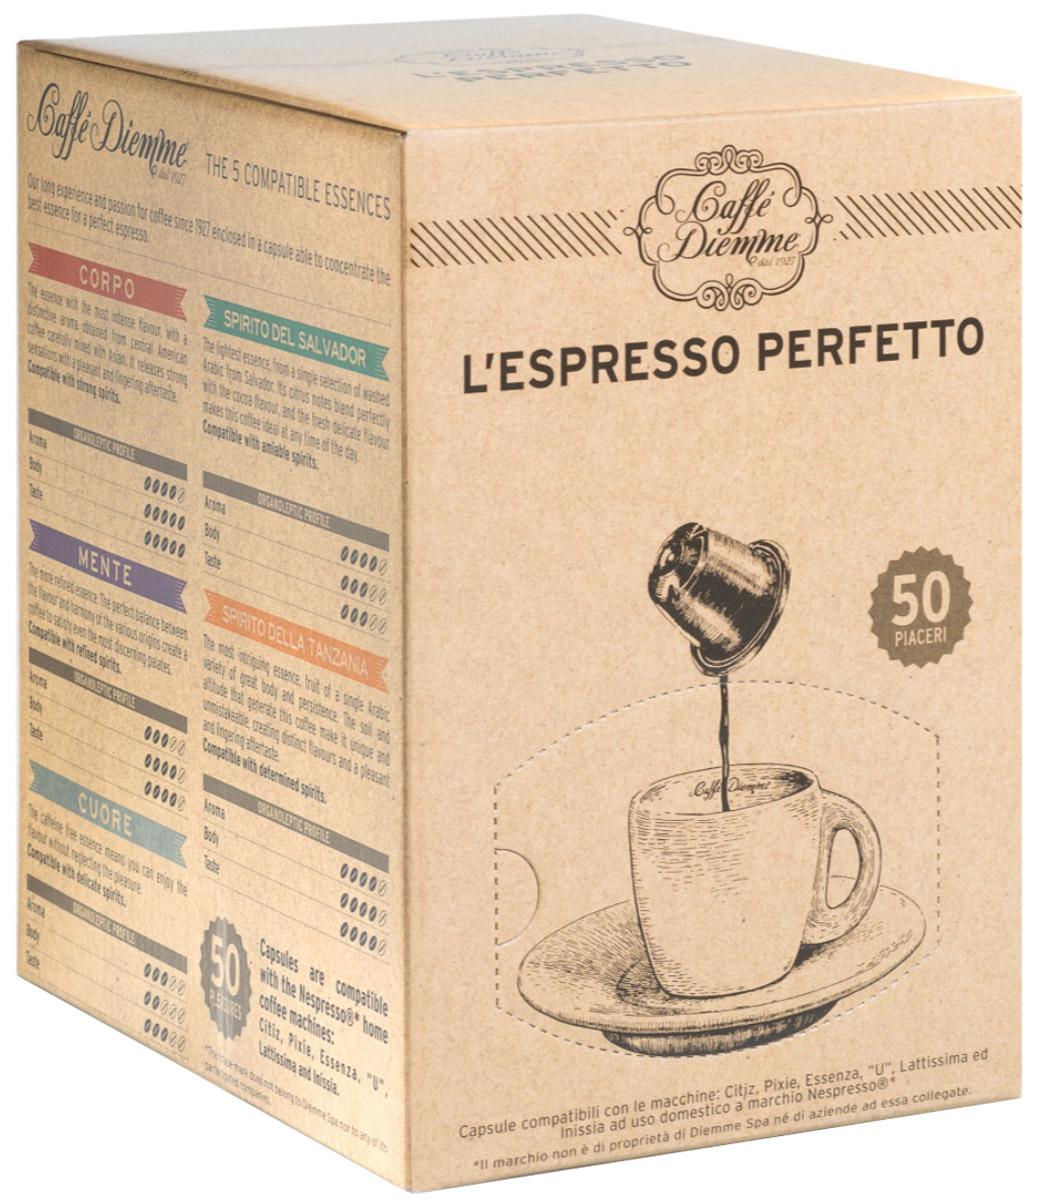 Diemme Caffe Corpo кофе в капсулах, 50 шт кофе в капсулах tassimo карт нуар кафе лонг интенс 128г